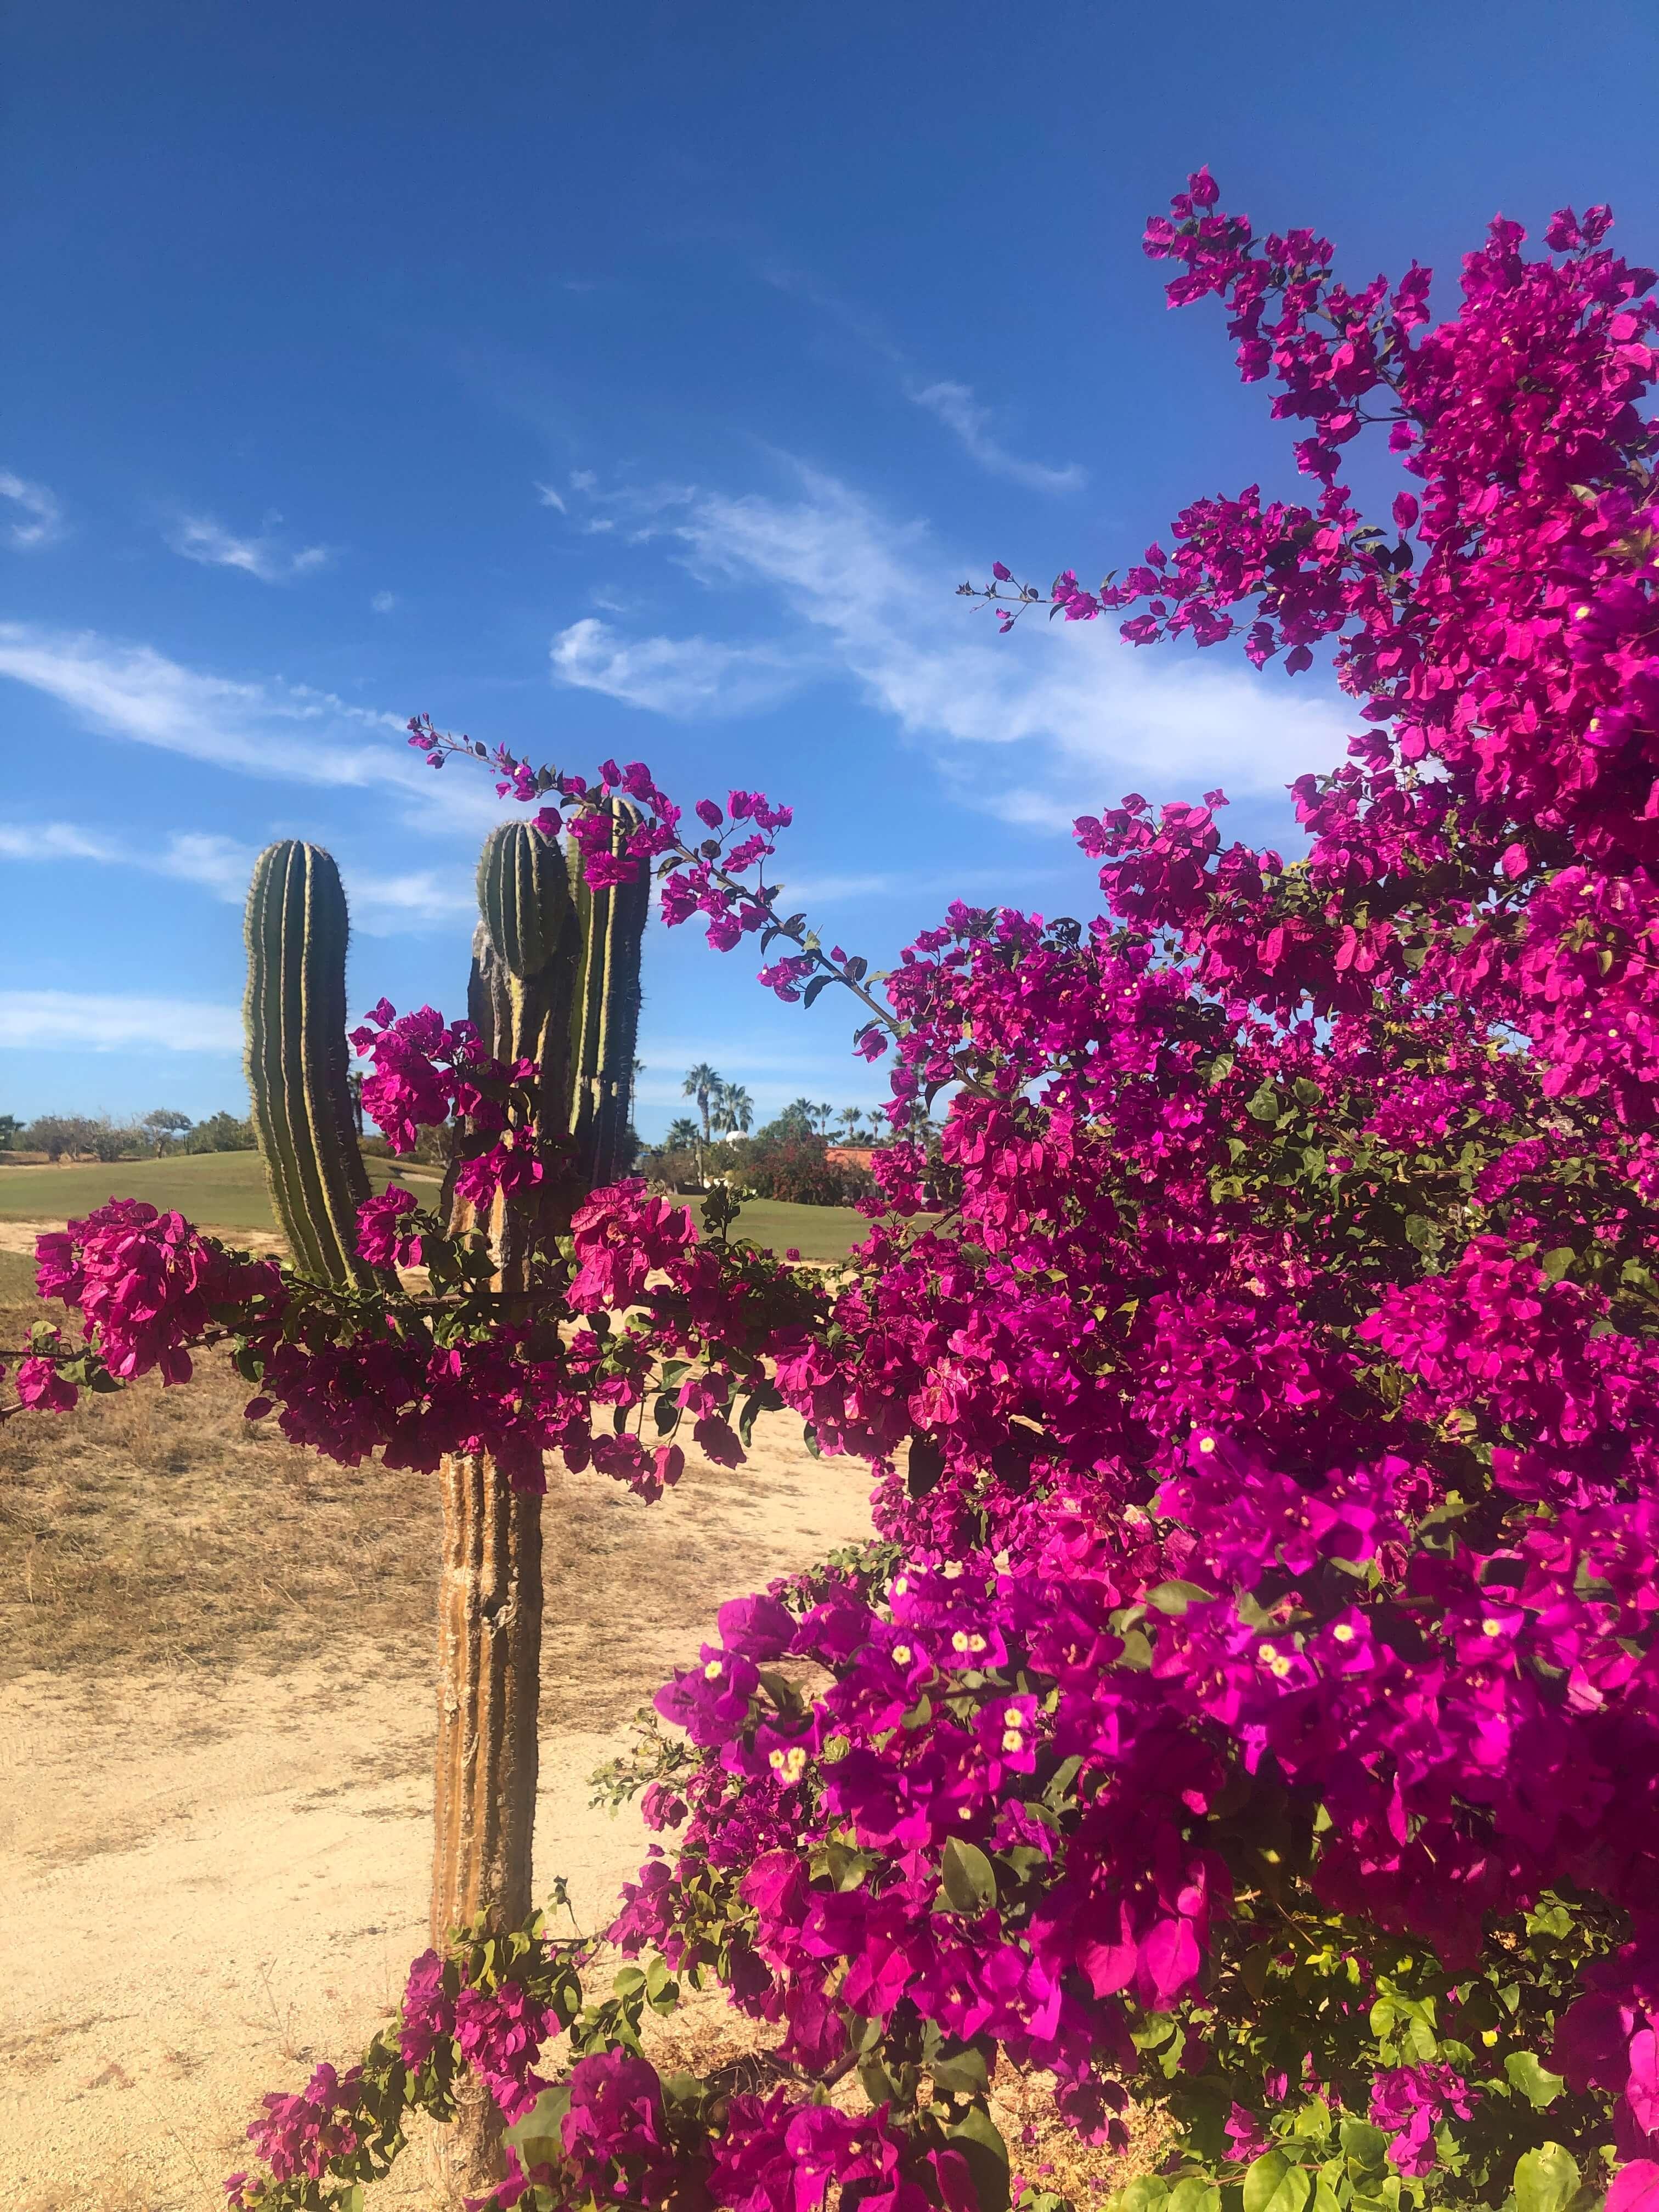 Megan-Reed-color-cactus